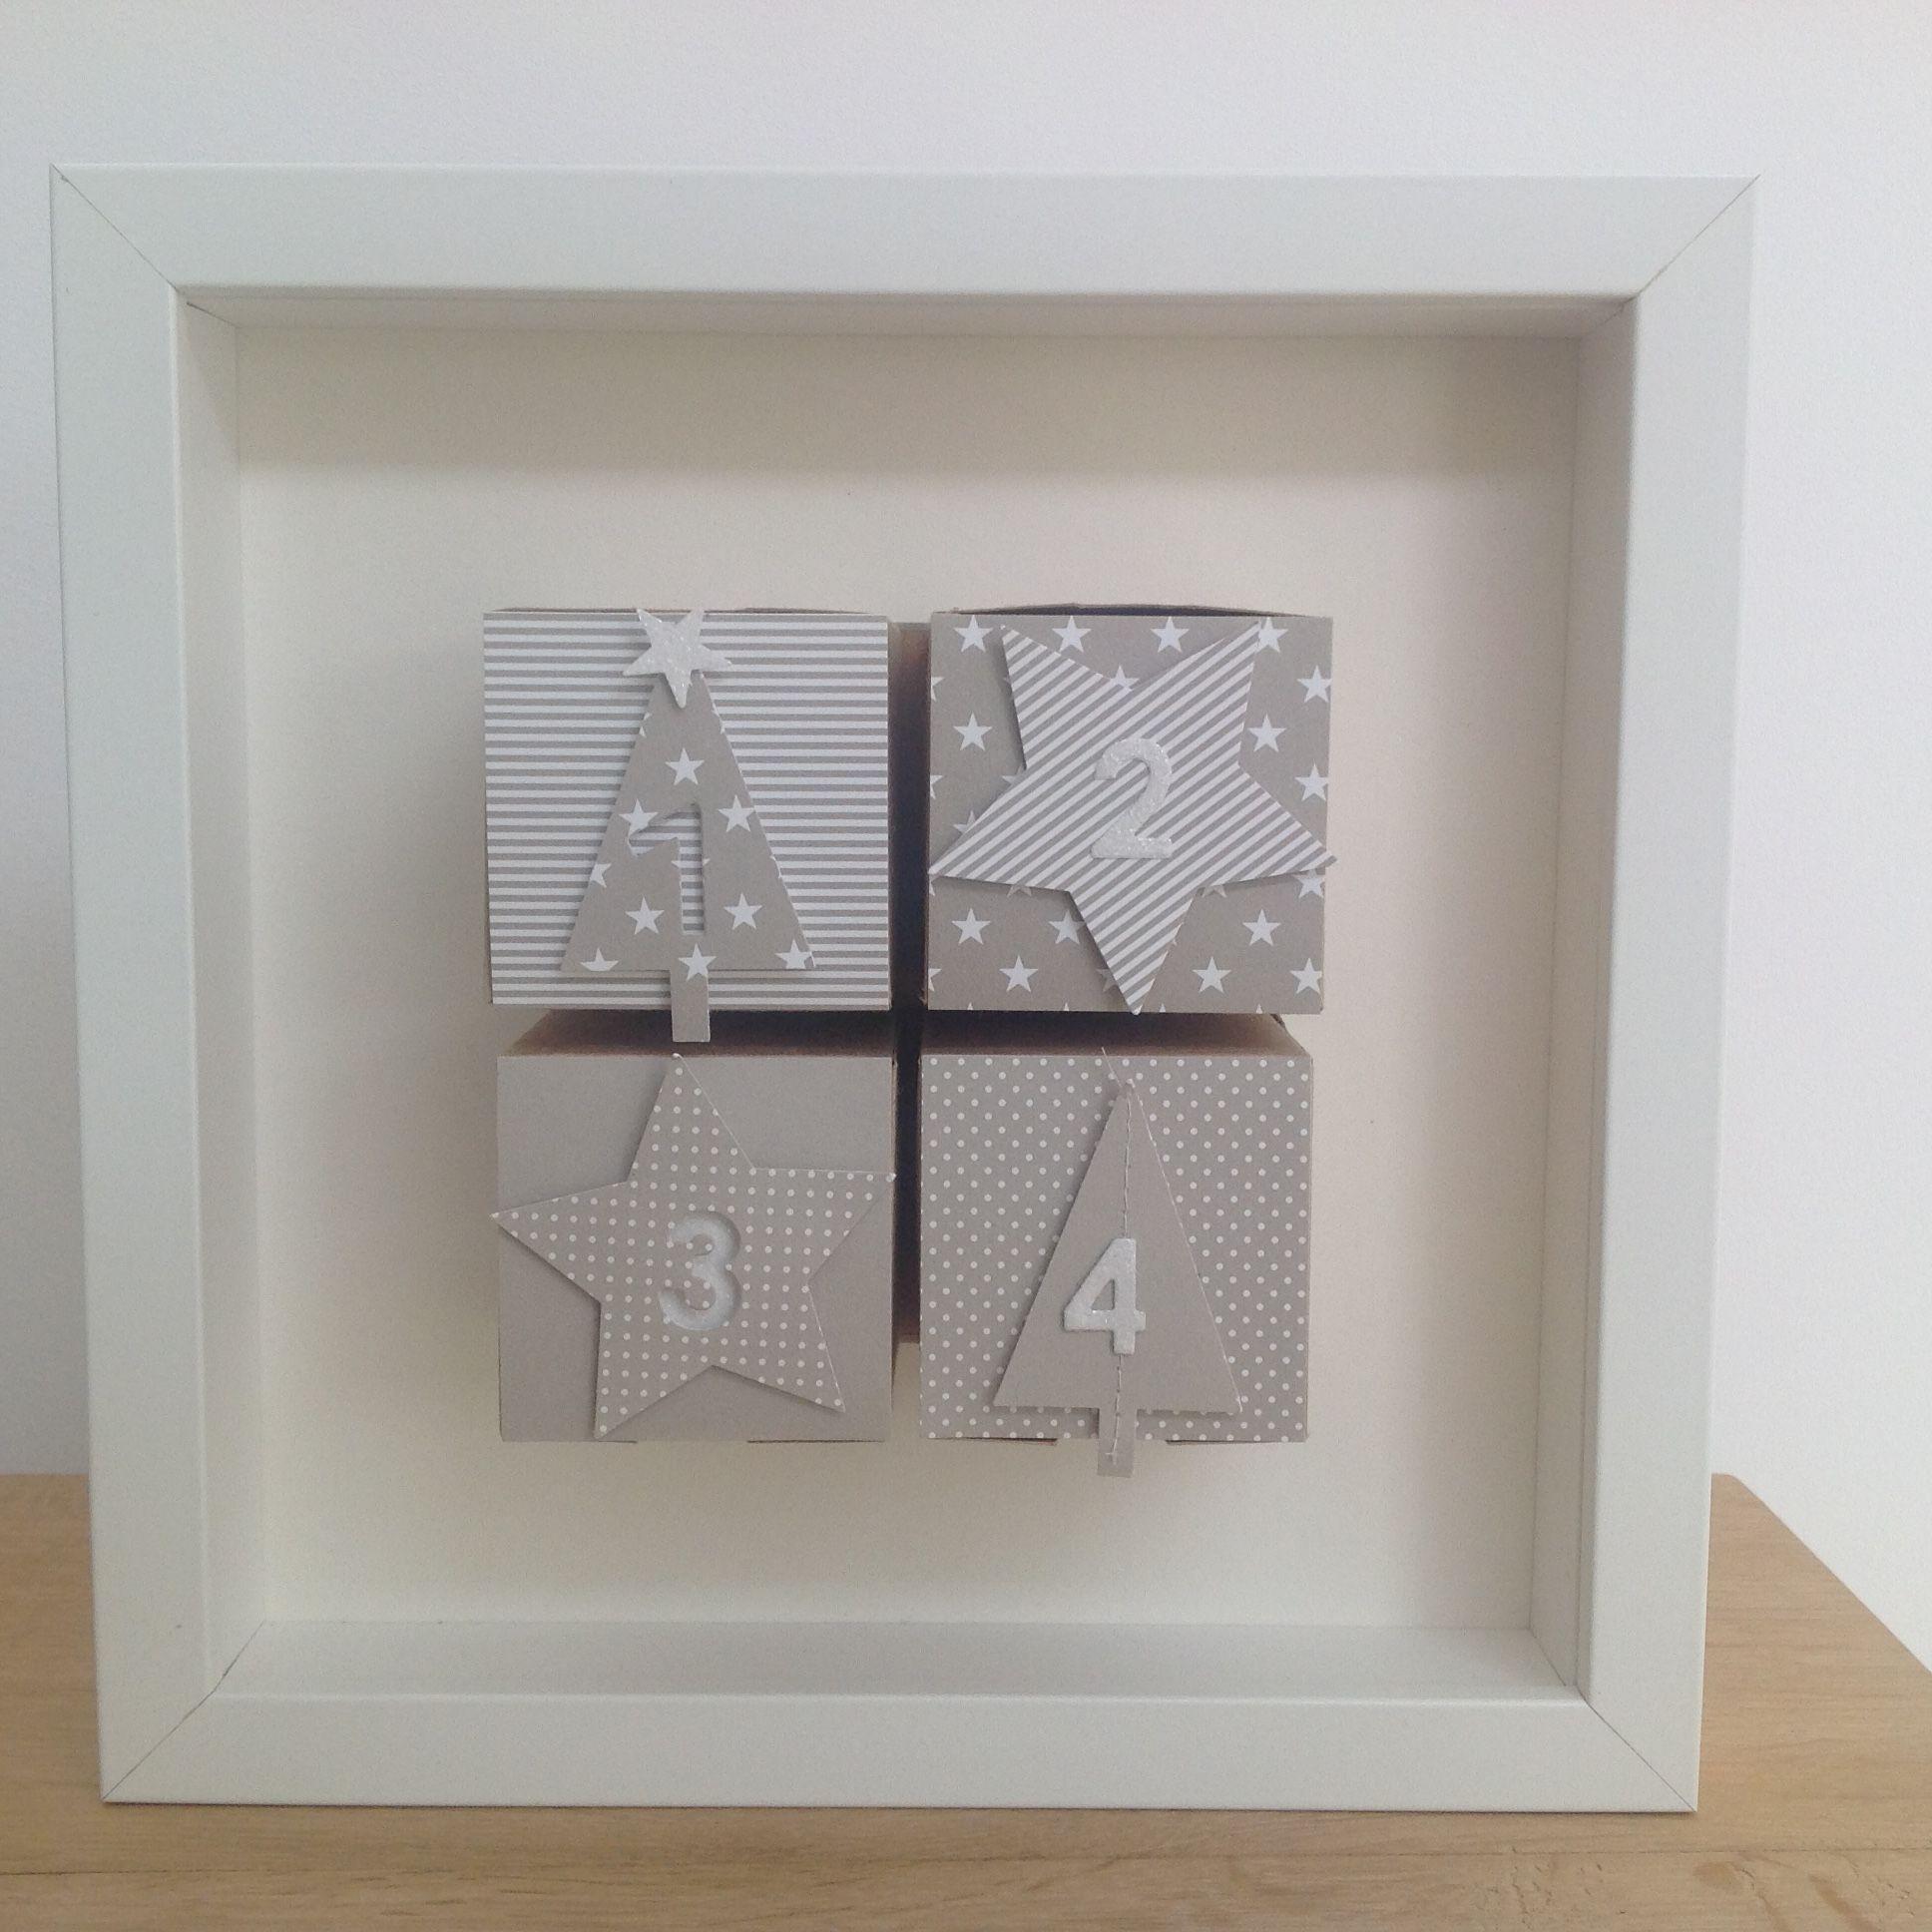 Adventskalender, Rahmen, Adventsboxen, Ikea, Stampin\'Up, Boxen ...